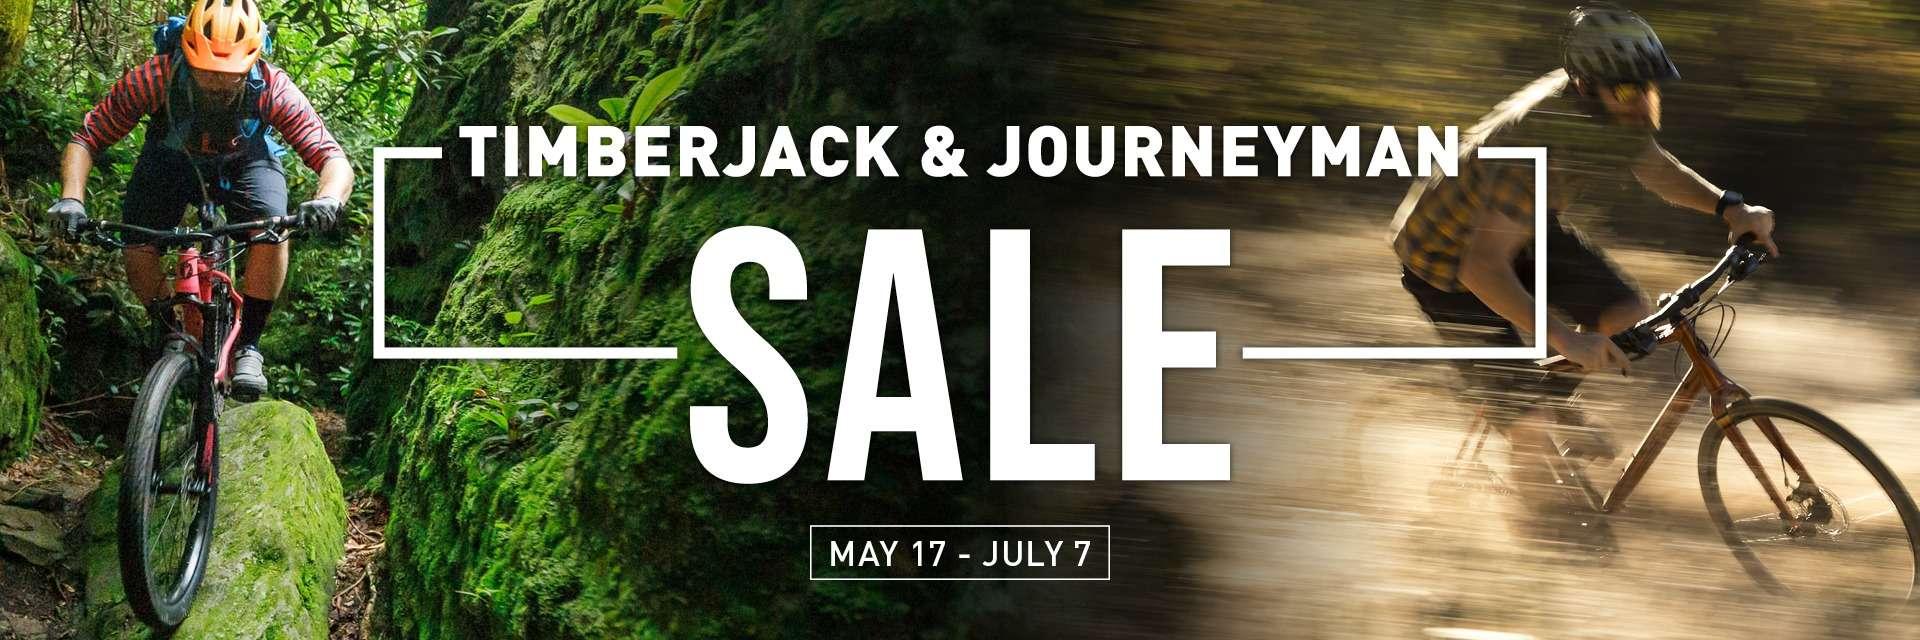 Salsa Timberjack Journeyman Bike Sale